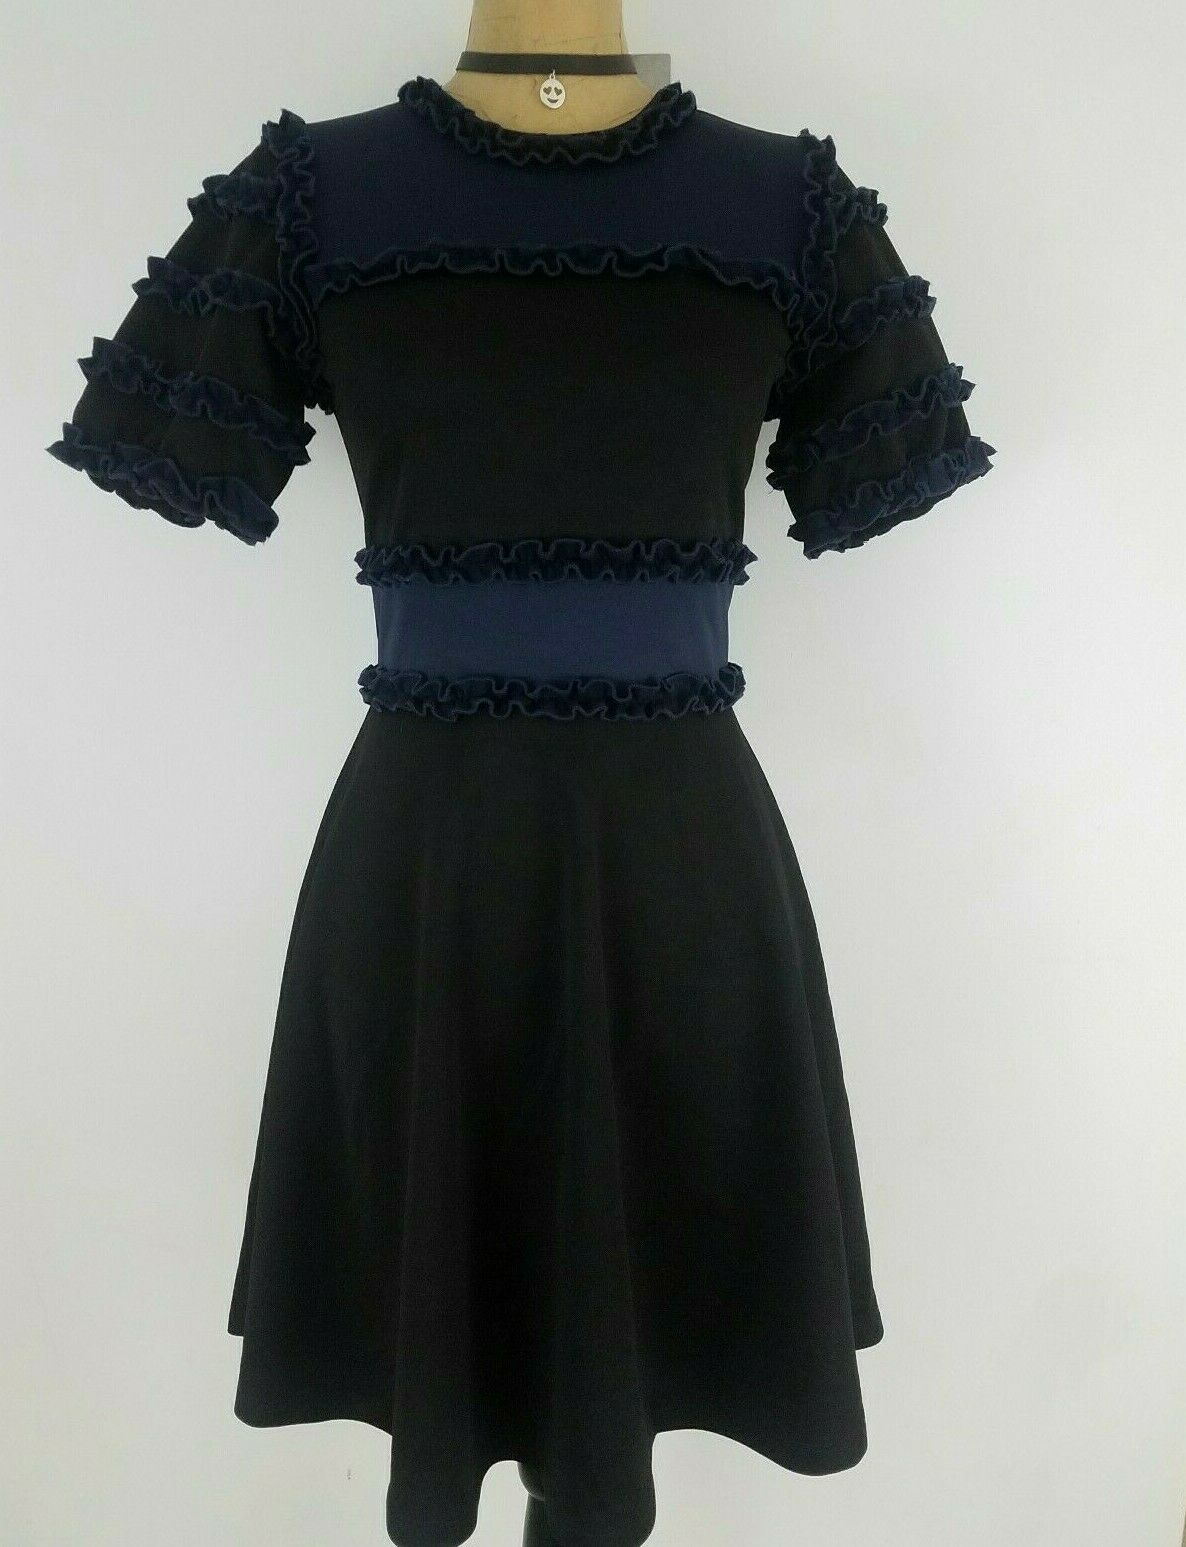 New Opening Ceremony damen Dress Größe 0 - 2 P Navy schwarz Ruffled Short Sleeve